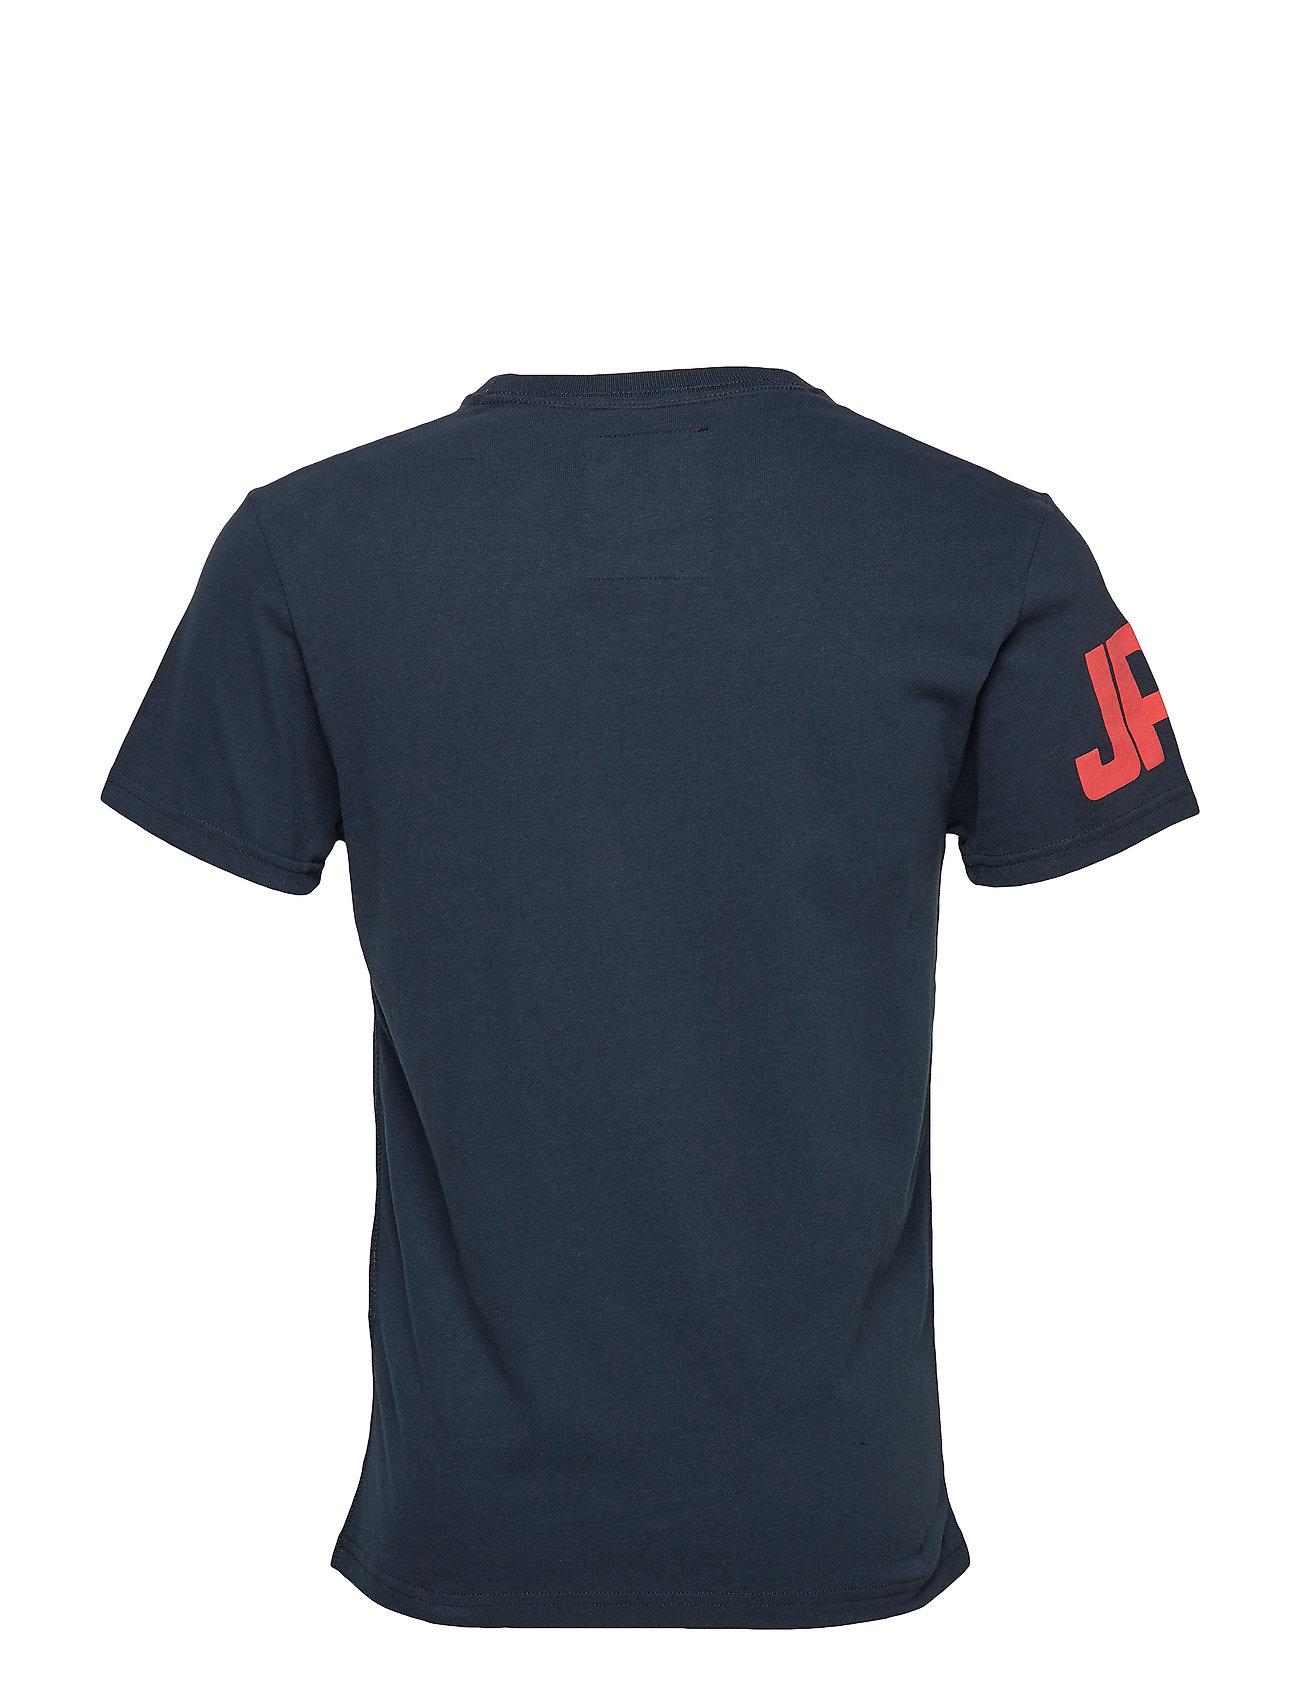 Miesten ALE T-paidat netistä  bd616b9da1